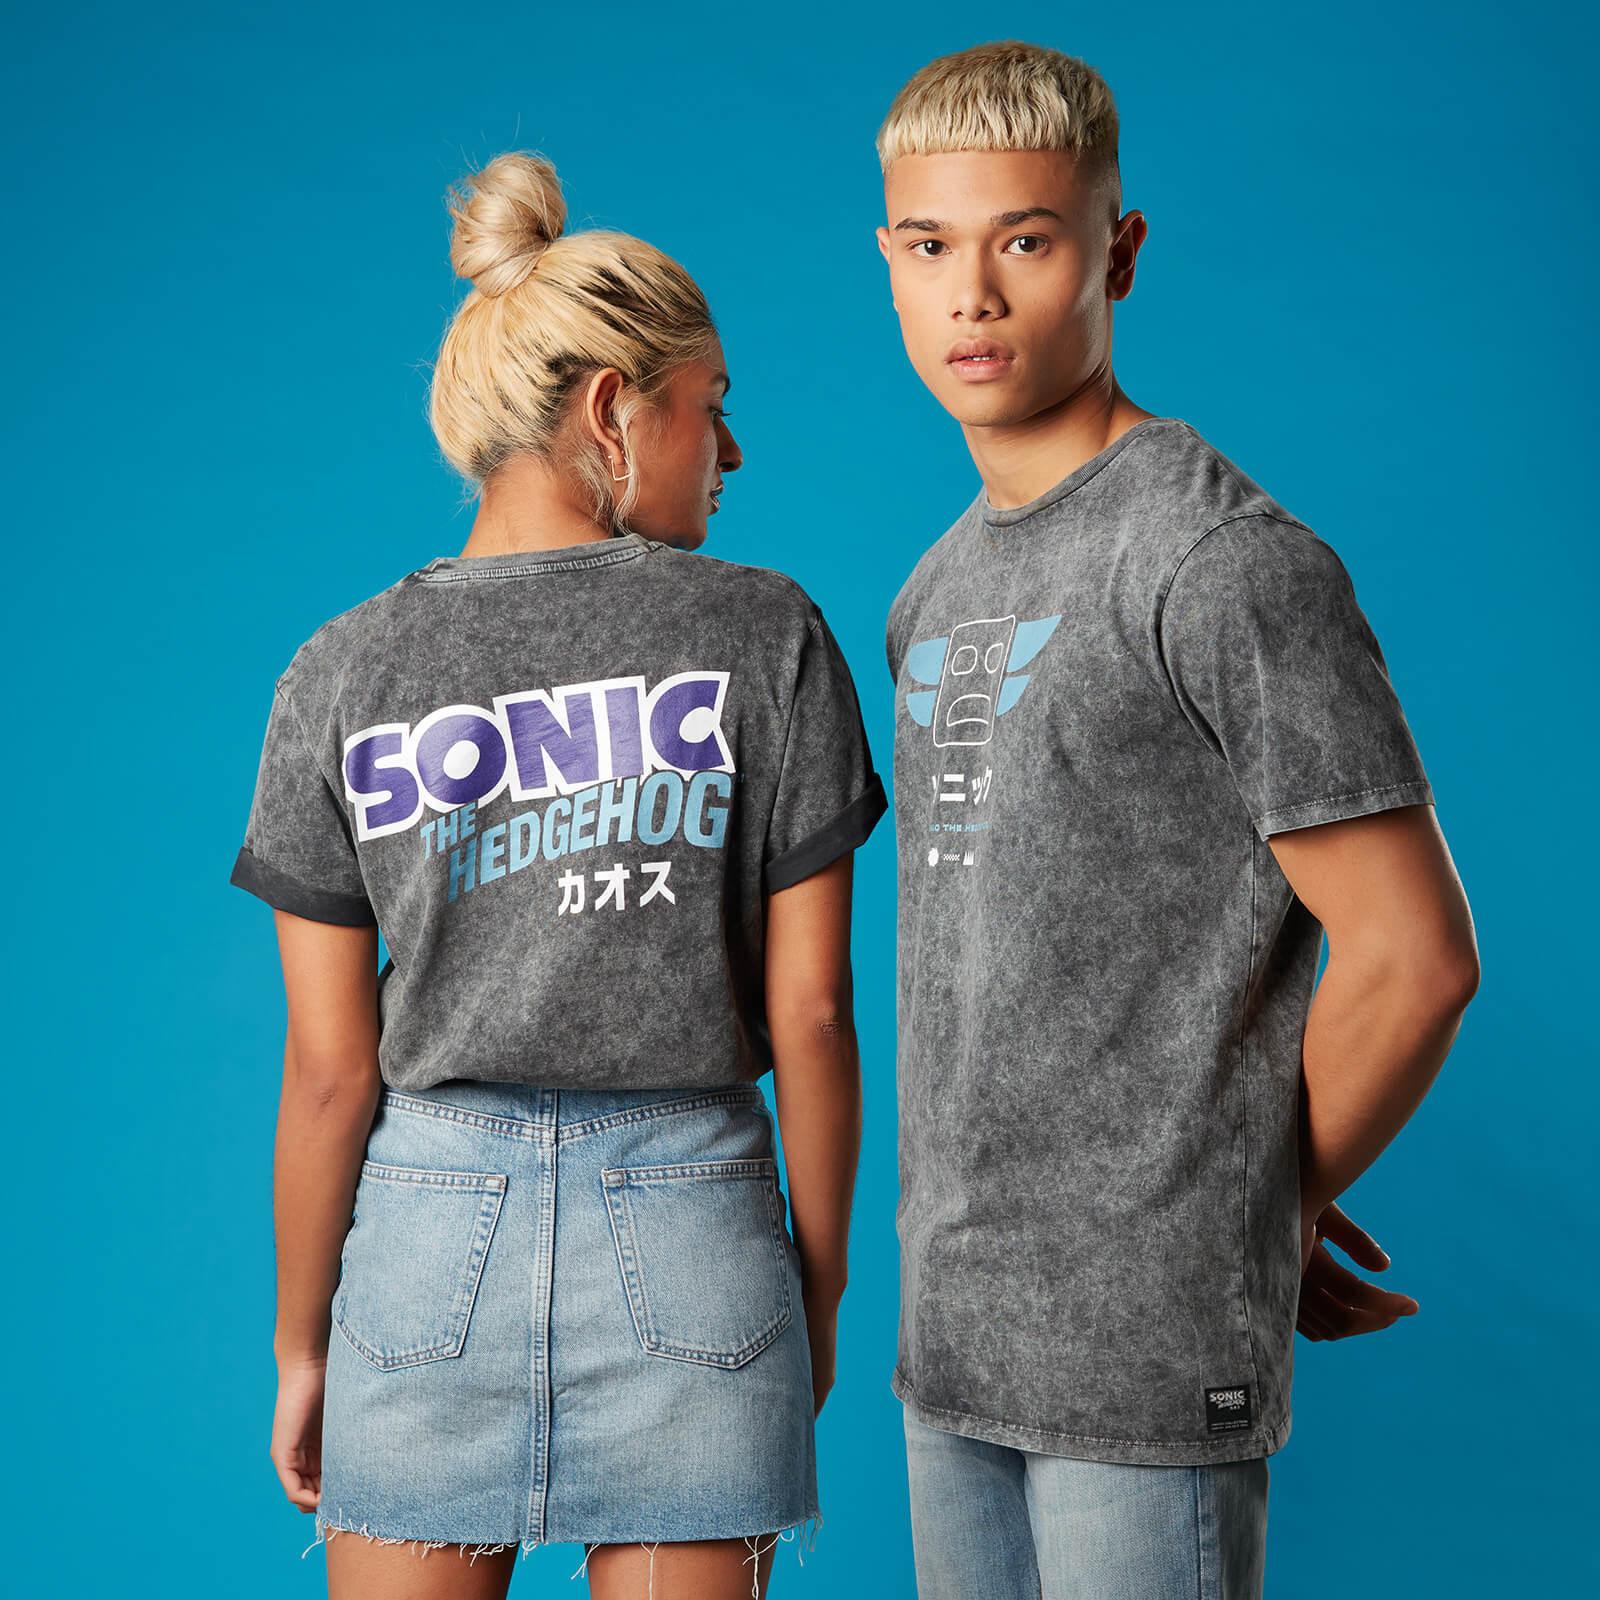 20% Rabatt auf exklusive Sonic the Hedgehog Kollektion + Sonic Tasse